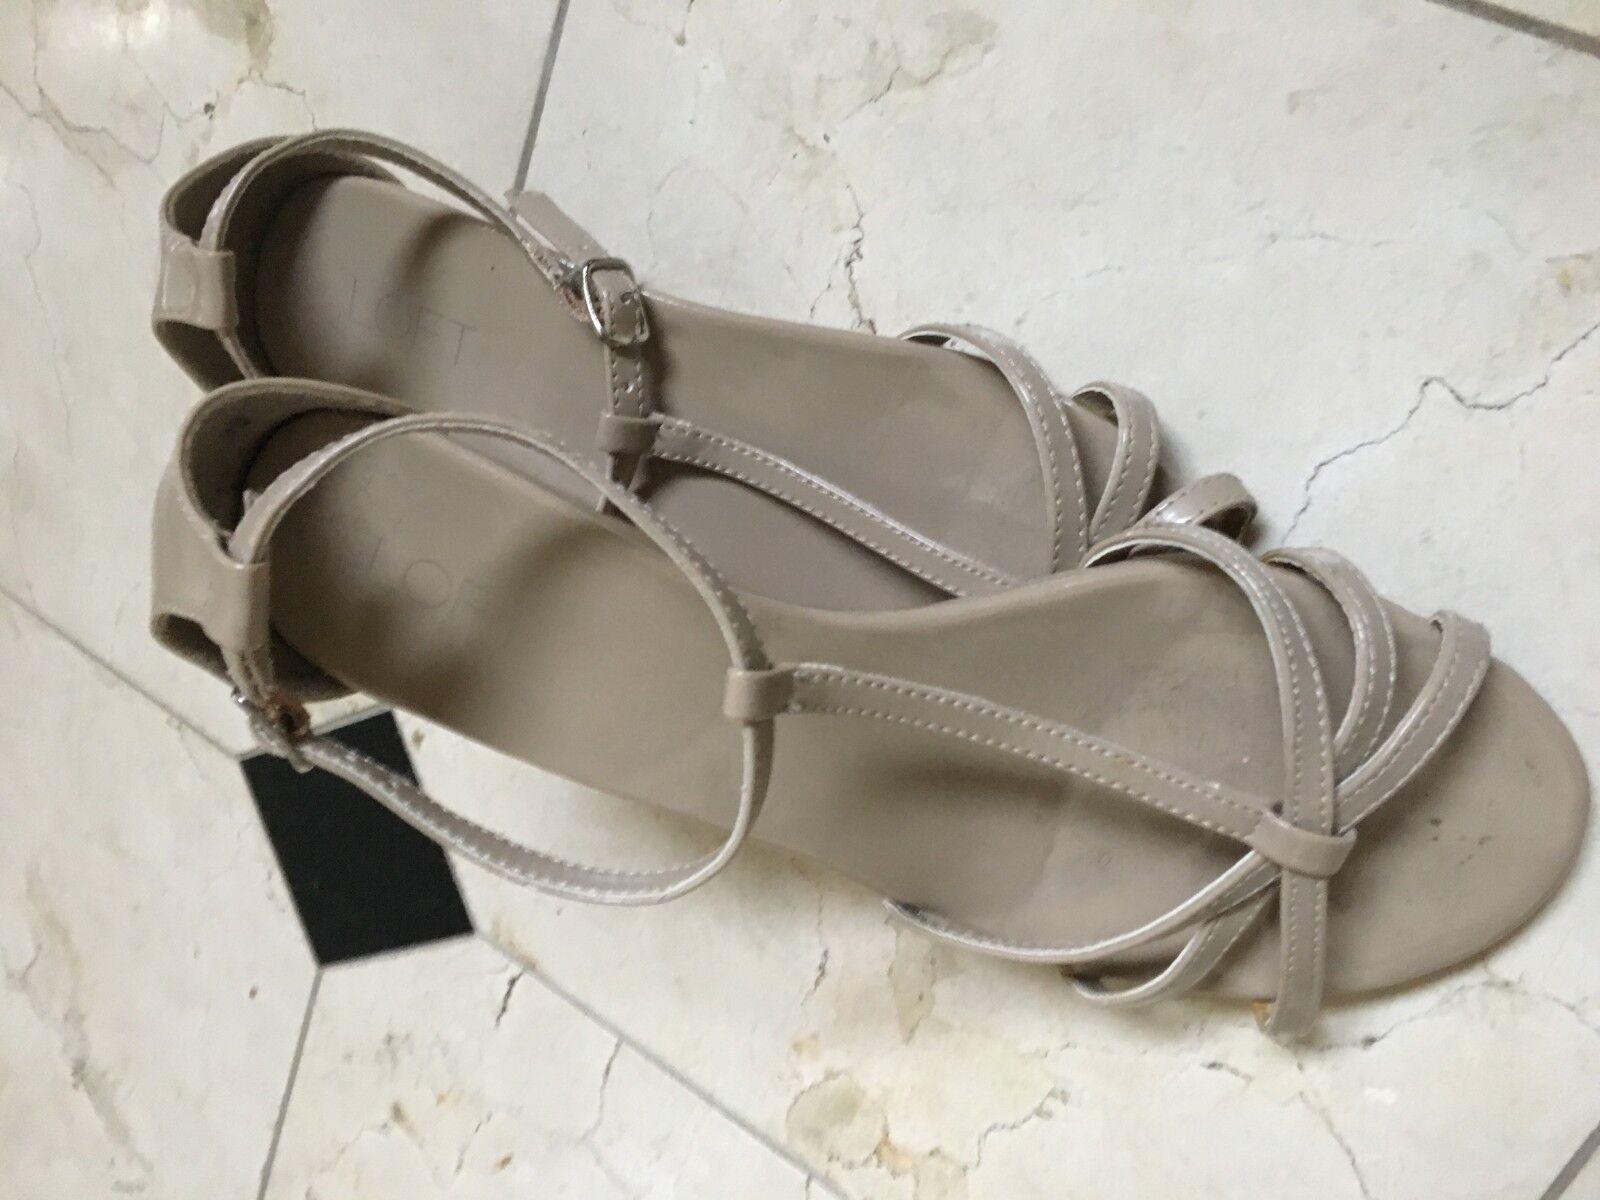 fd8f7348 ANN TAYLOR LOFT Tan brevet 2 Wedge T-Sandales Confort Chaussure ...